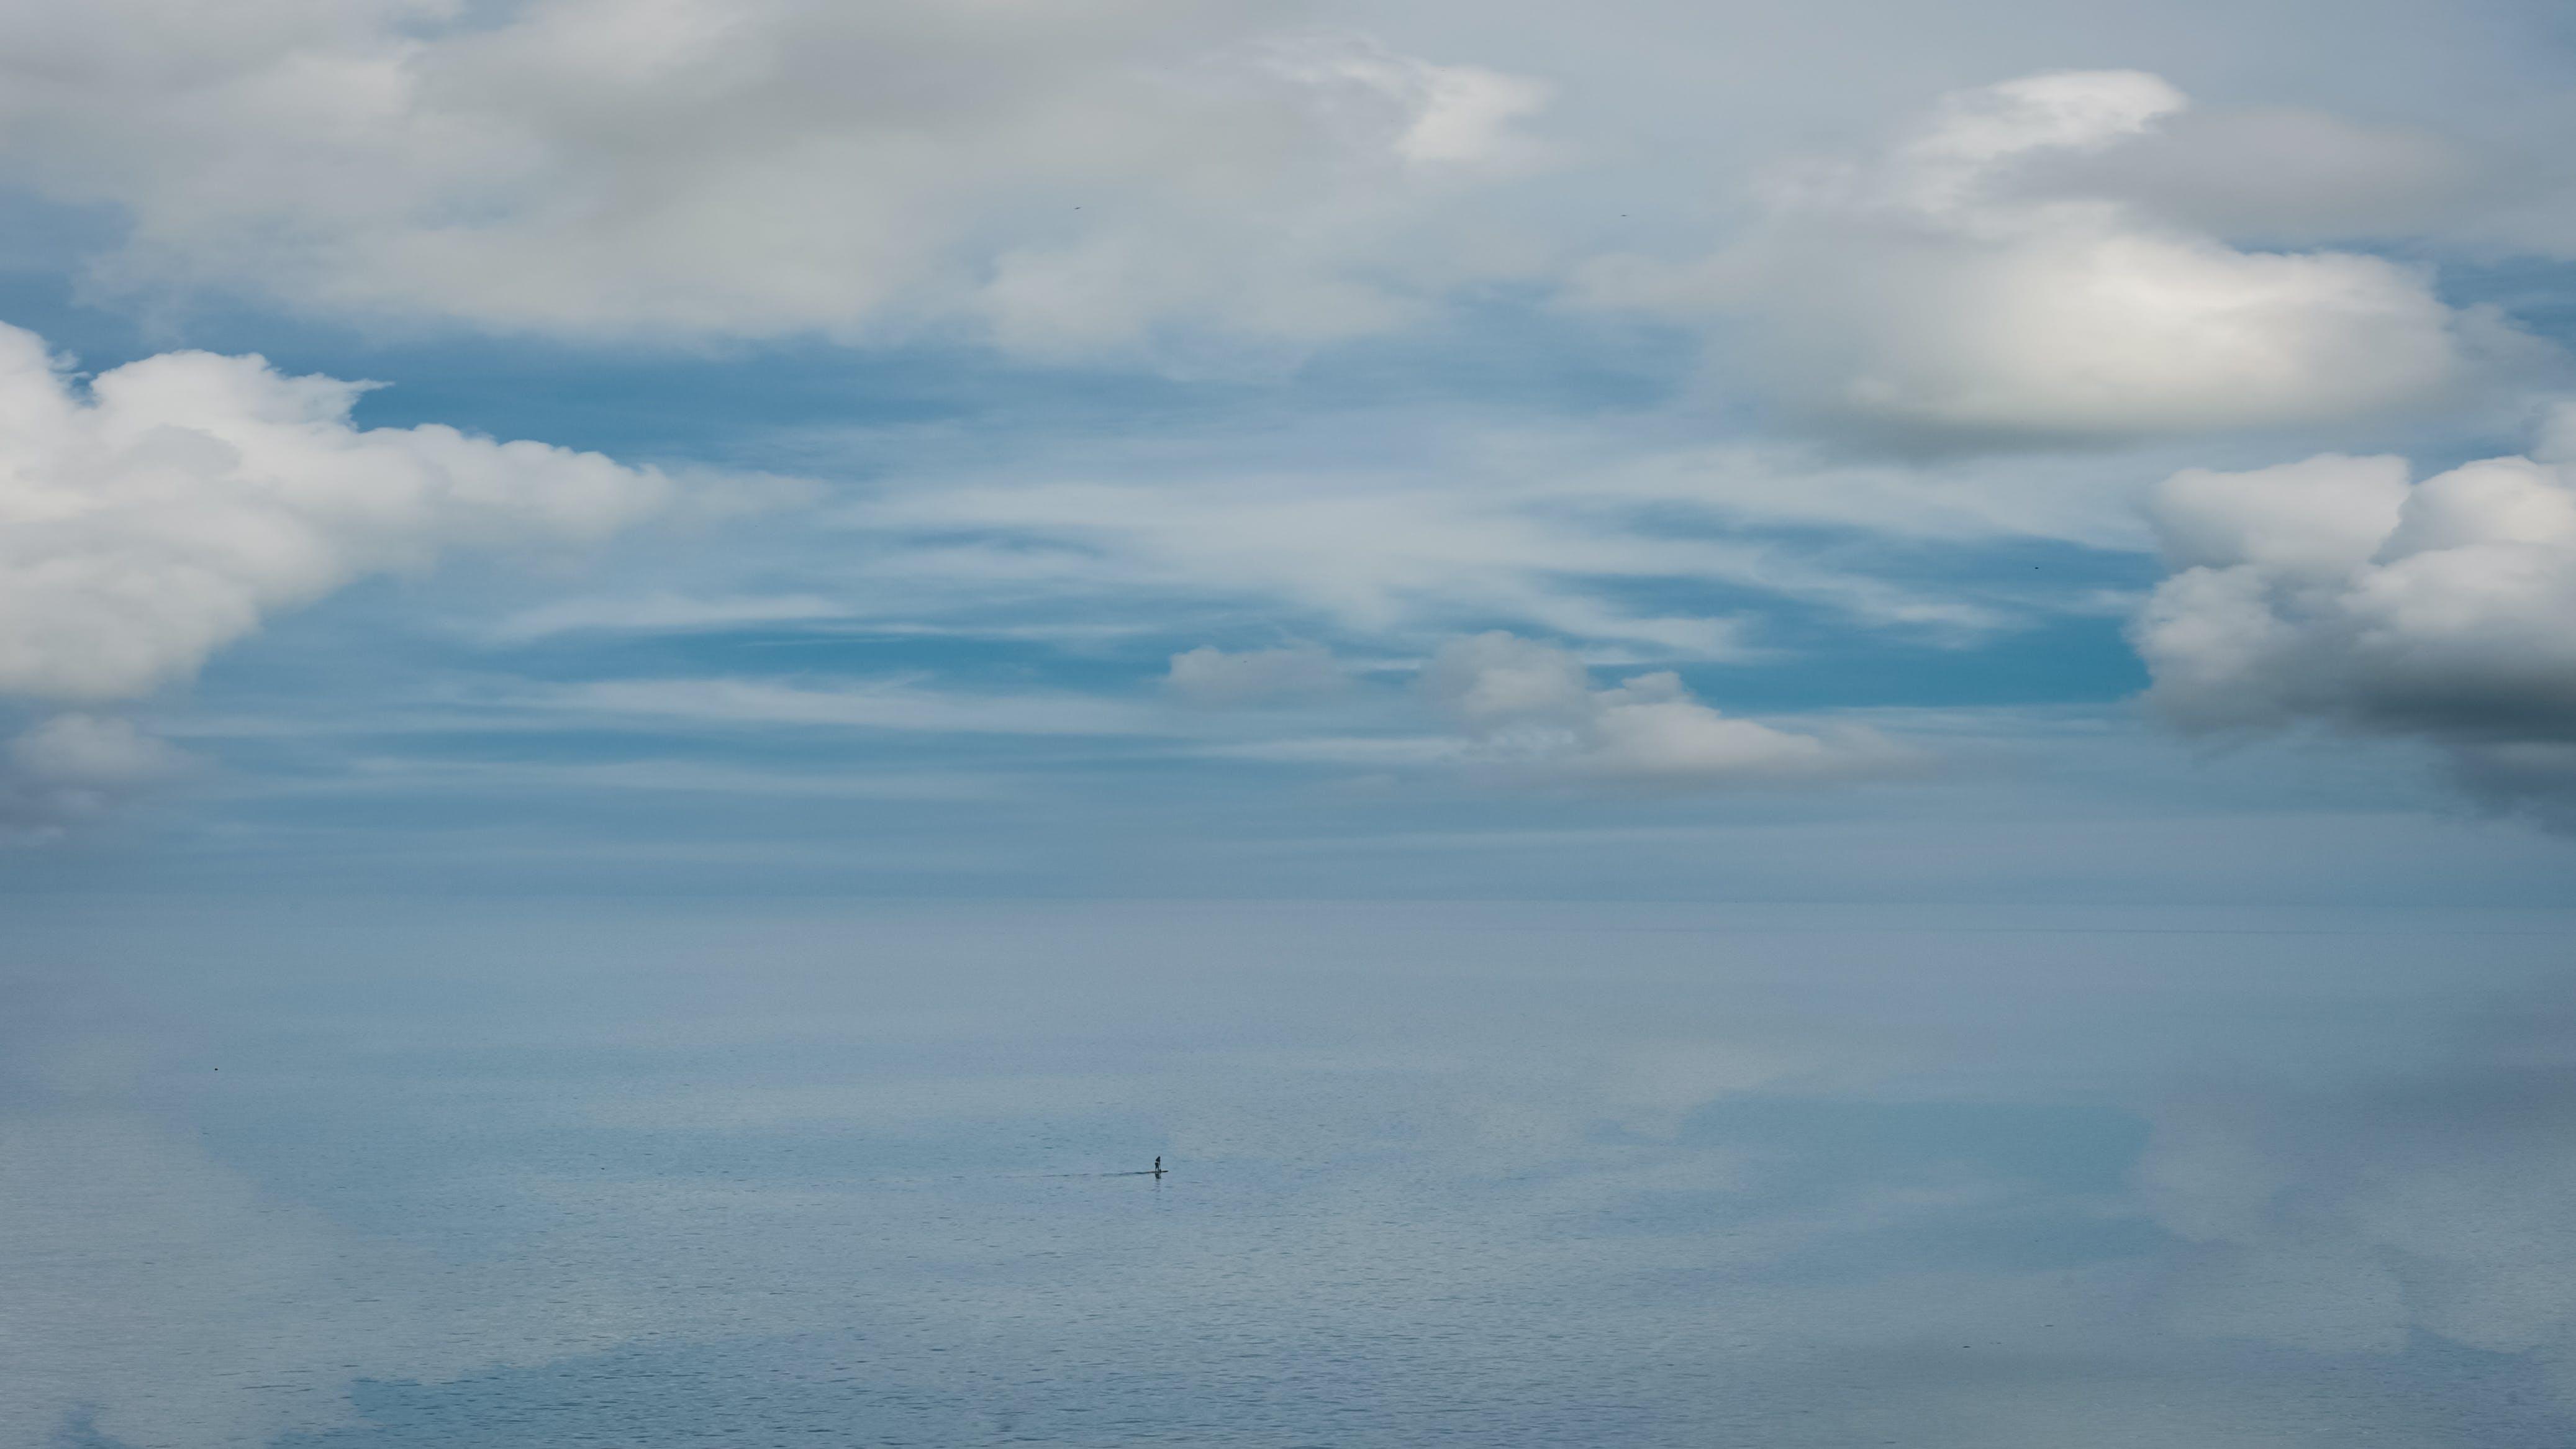 Scenic View of Ocean Under Cloudy Sky